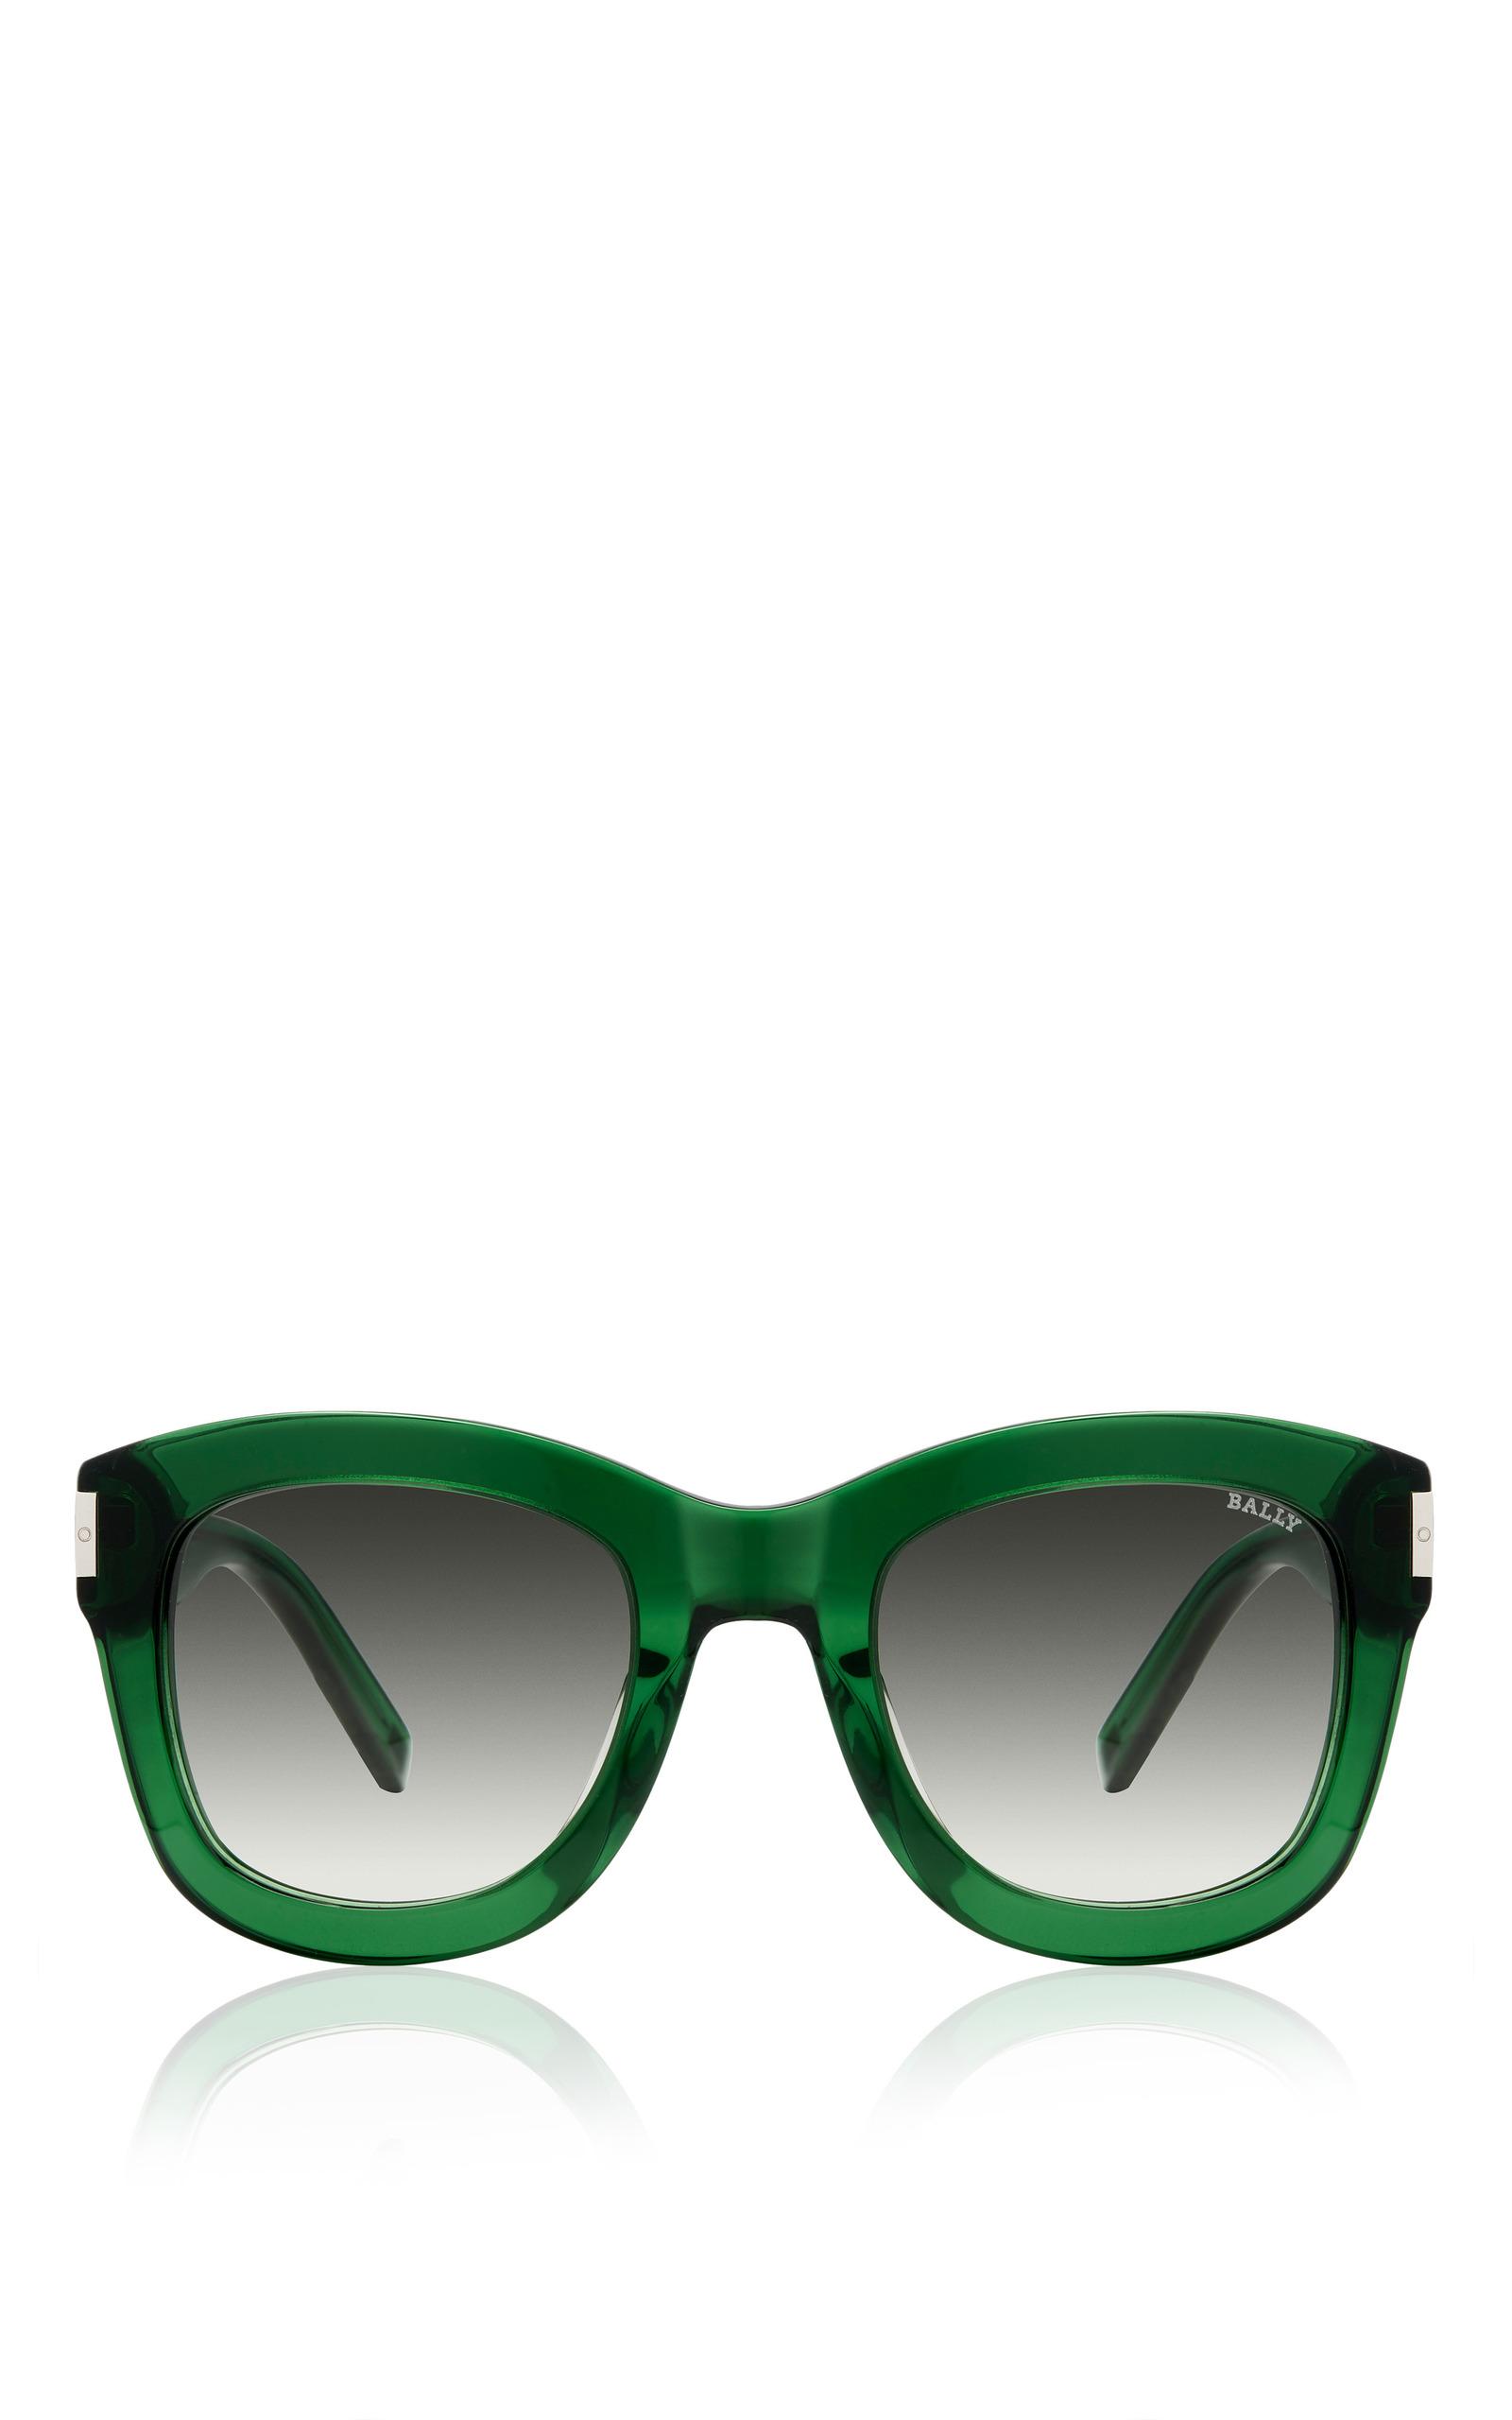 4c783fa176c BallyGreen Acetate Sunglasses. CLOSE. Loading. Loading. FULL SCREEN. Click  Product to Zoom